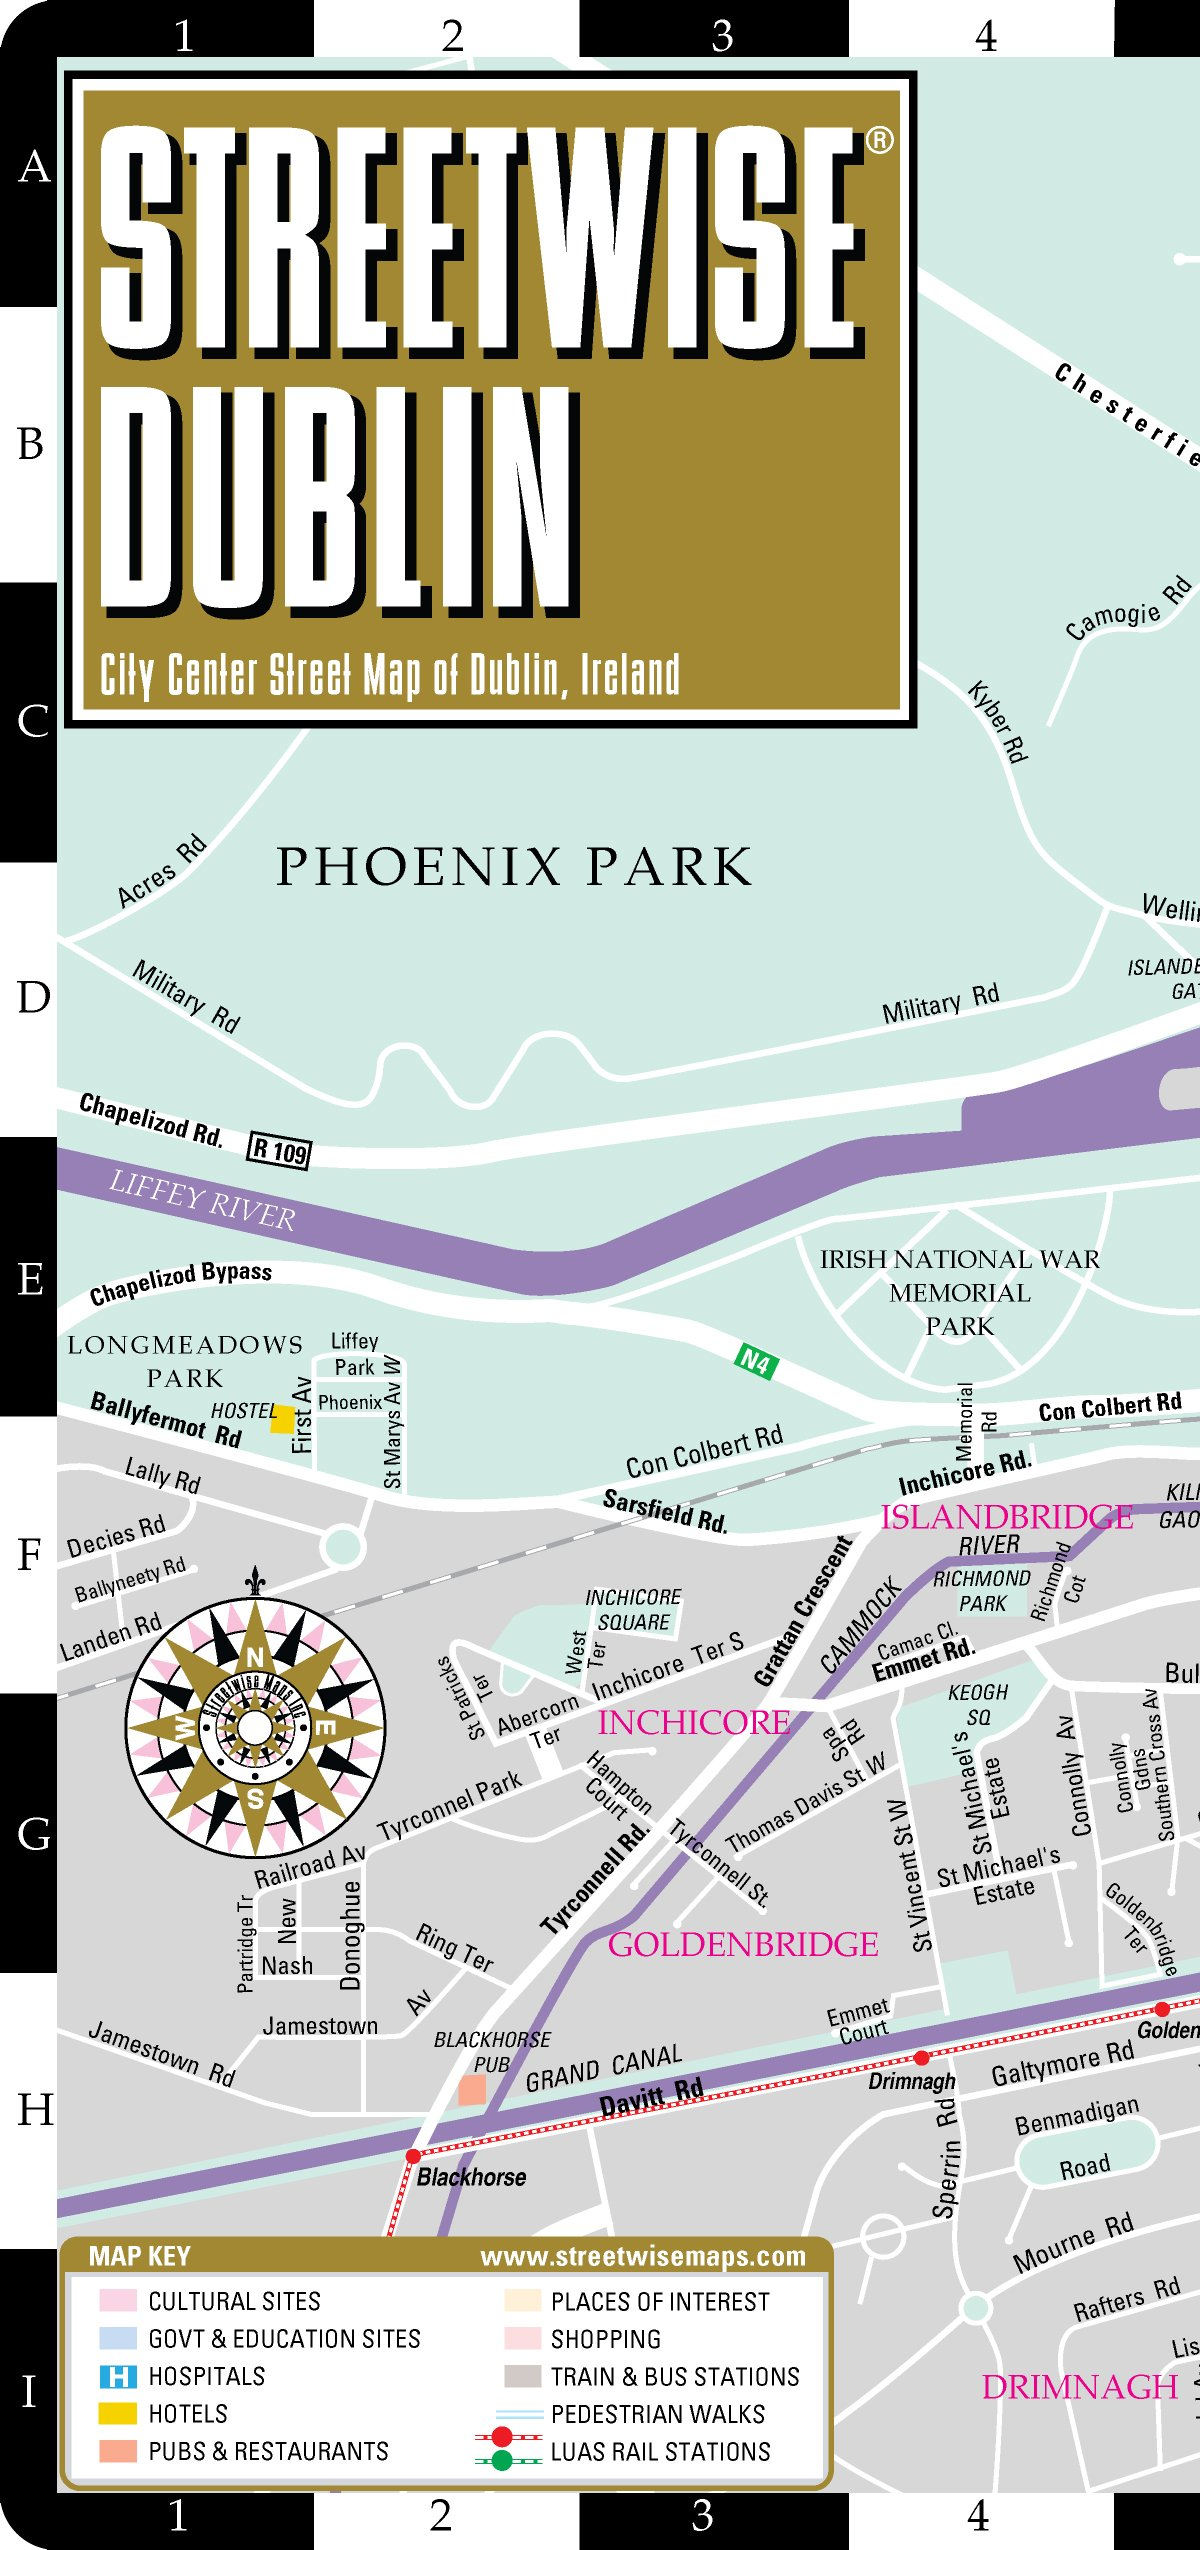 Map Of Dublin Ireland And Surrounding Area.Streetwise Dublin Map Laminated City Center Street Map Of Dublin